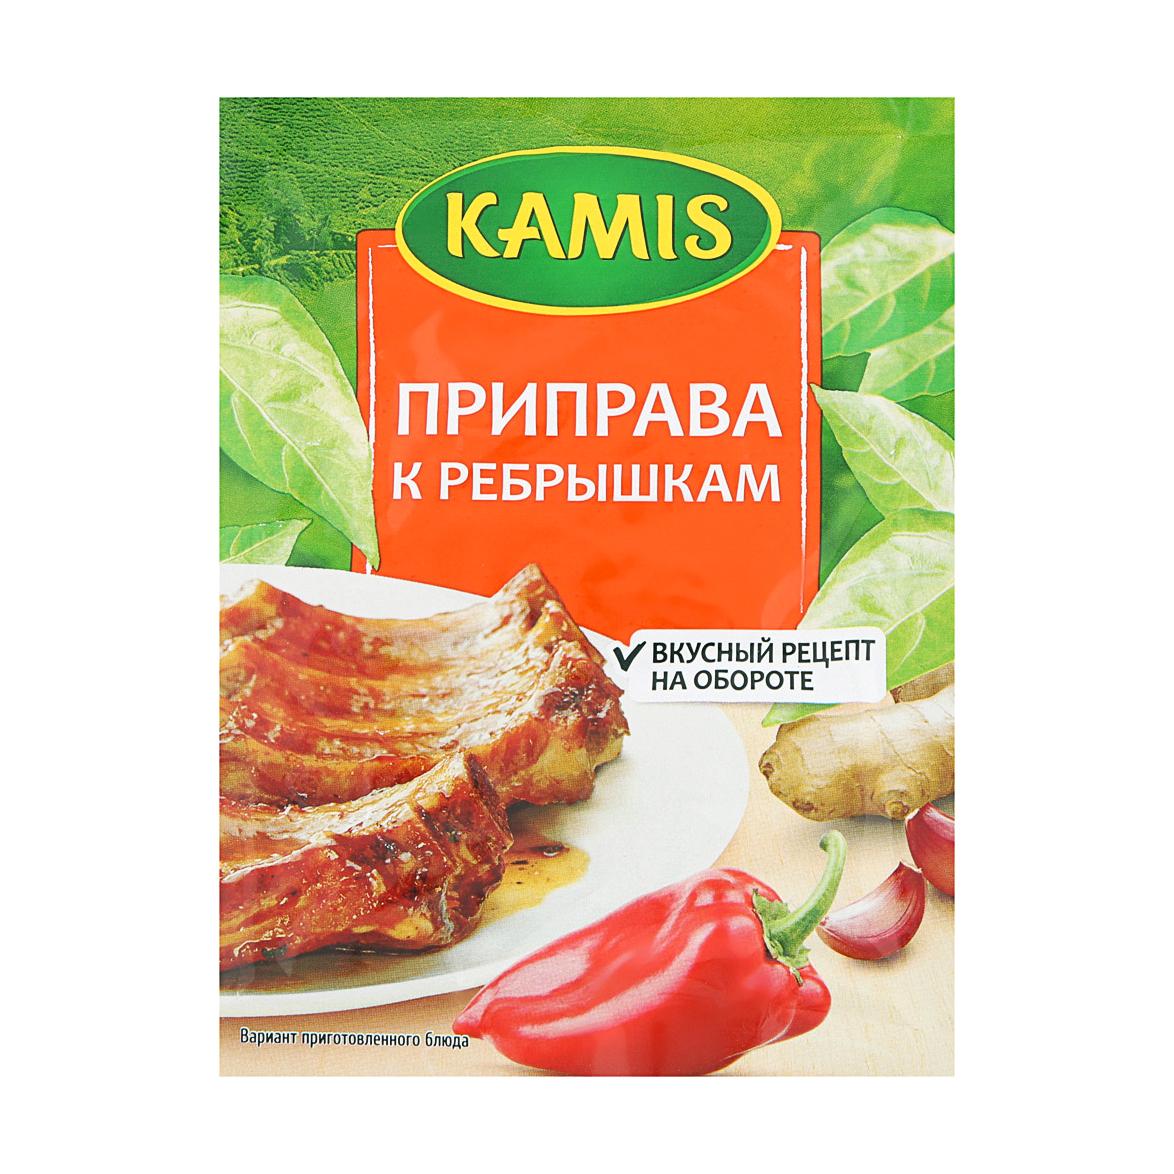 Приправа Kamis к рёбрышкам 25 г kamis приправа травы средиземноморья 4х10 г